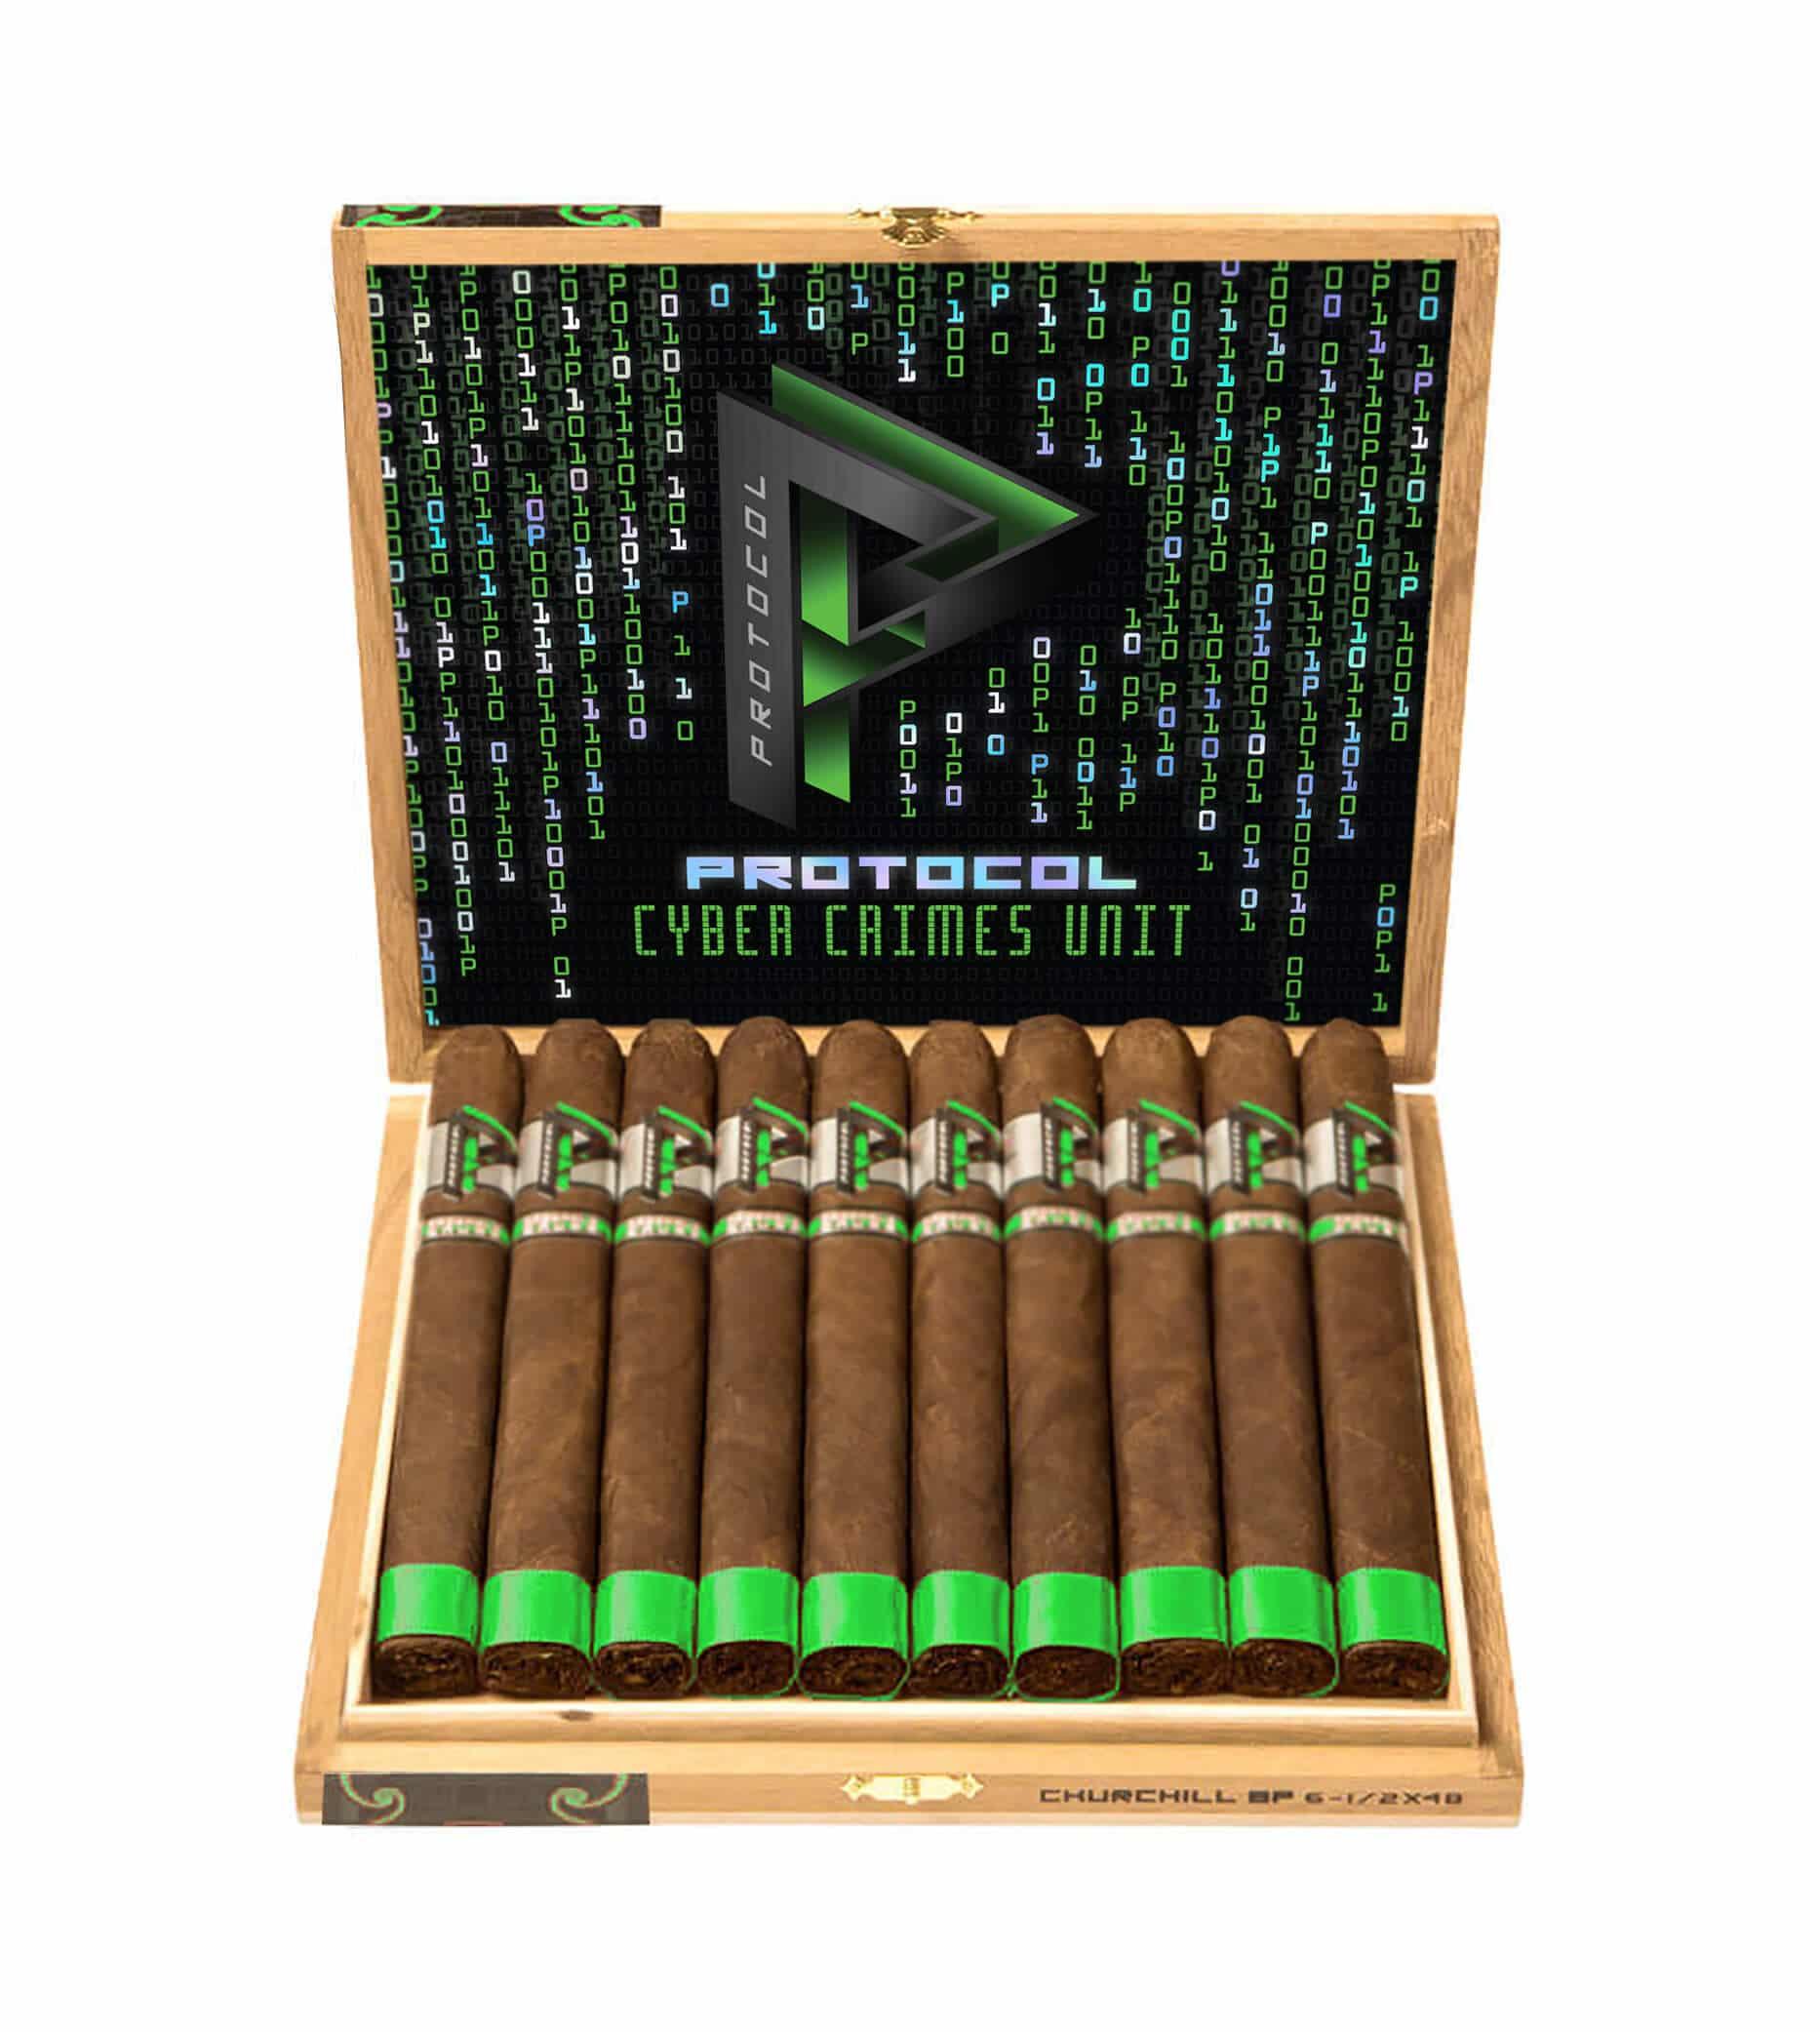 Cigar News: Protocol Cigars Unveils Latest Release: Cyber Crimes Unit (CCU)